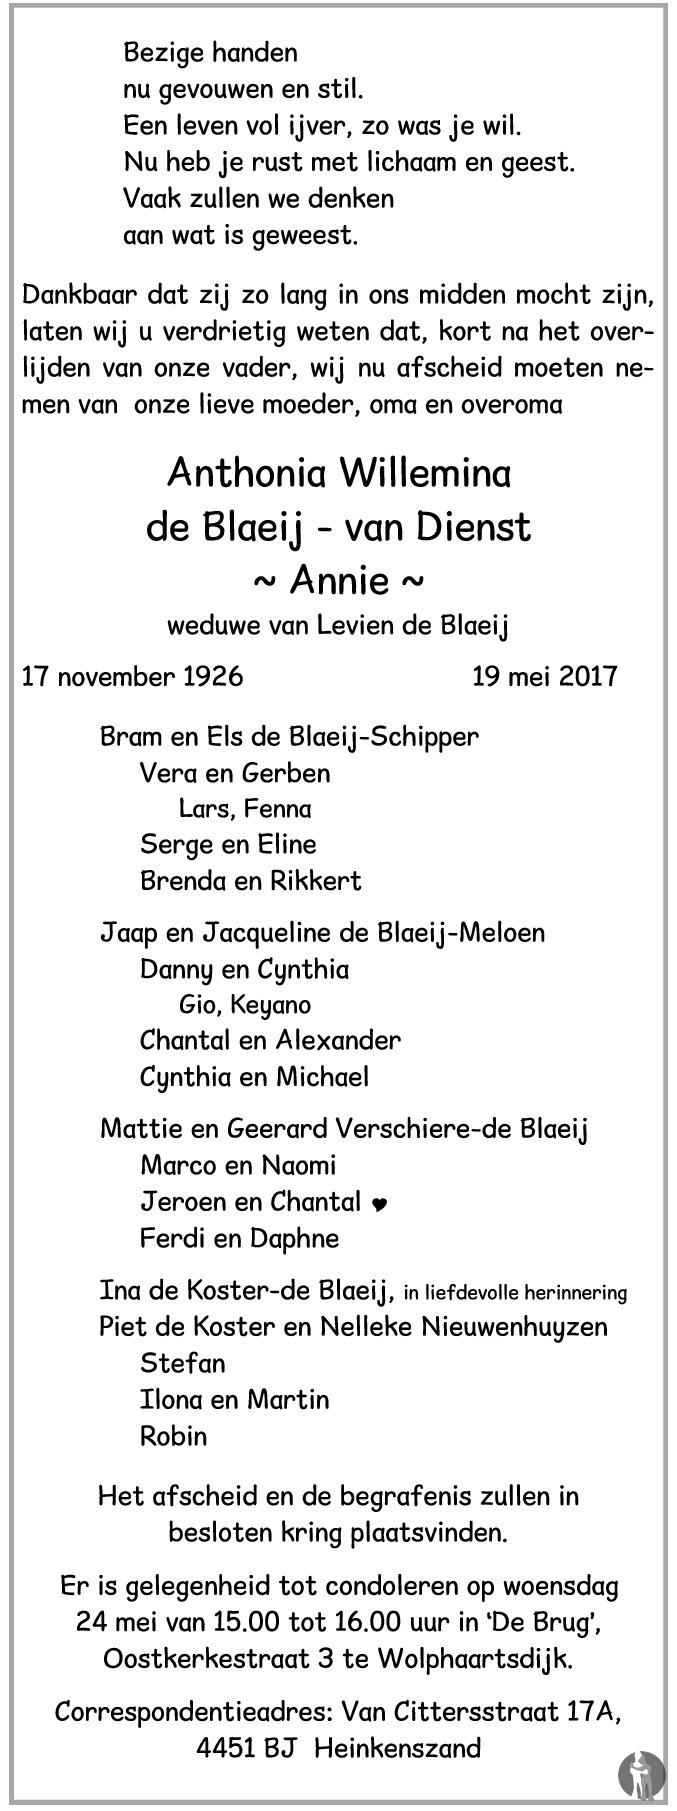 Overlijdensbericht van Anthonia Willemina (Annie) de Blaeij - van Dienst in PZC Provinciale Zeeuwse Courant